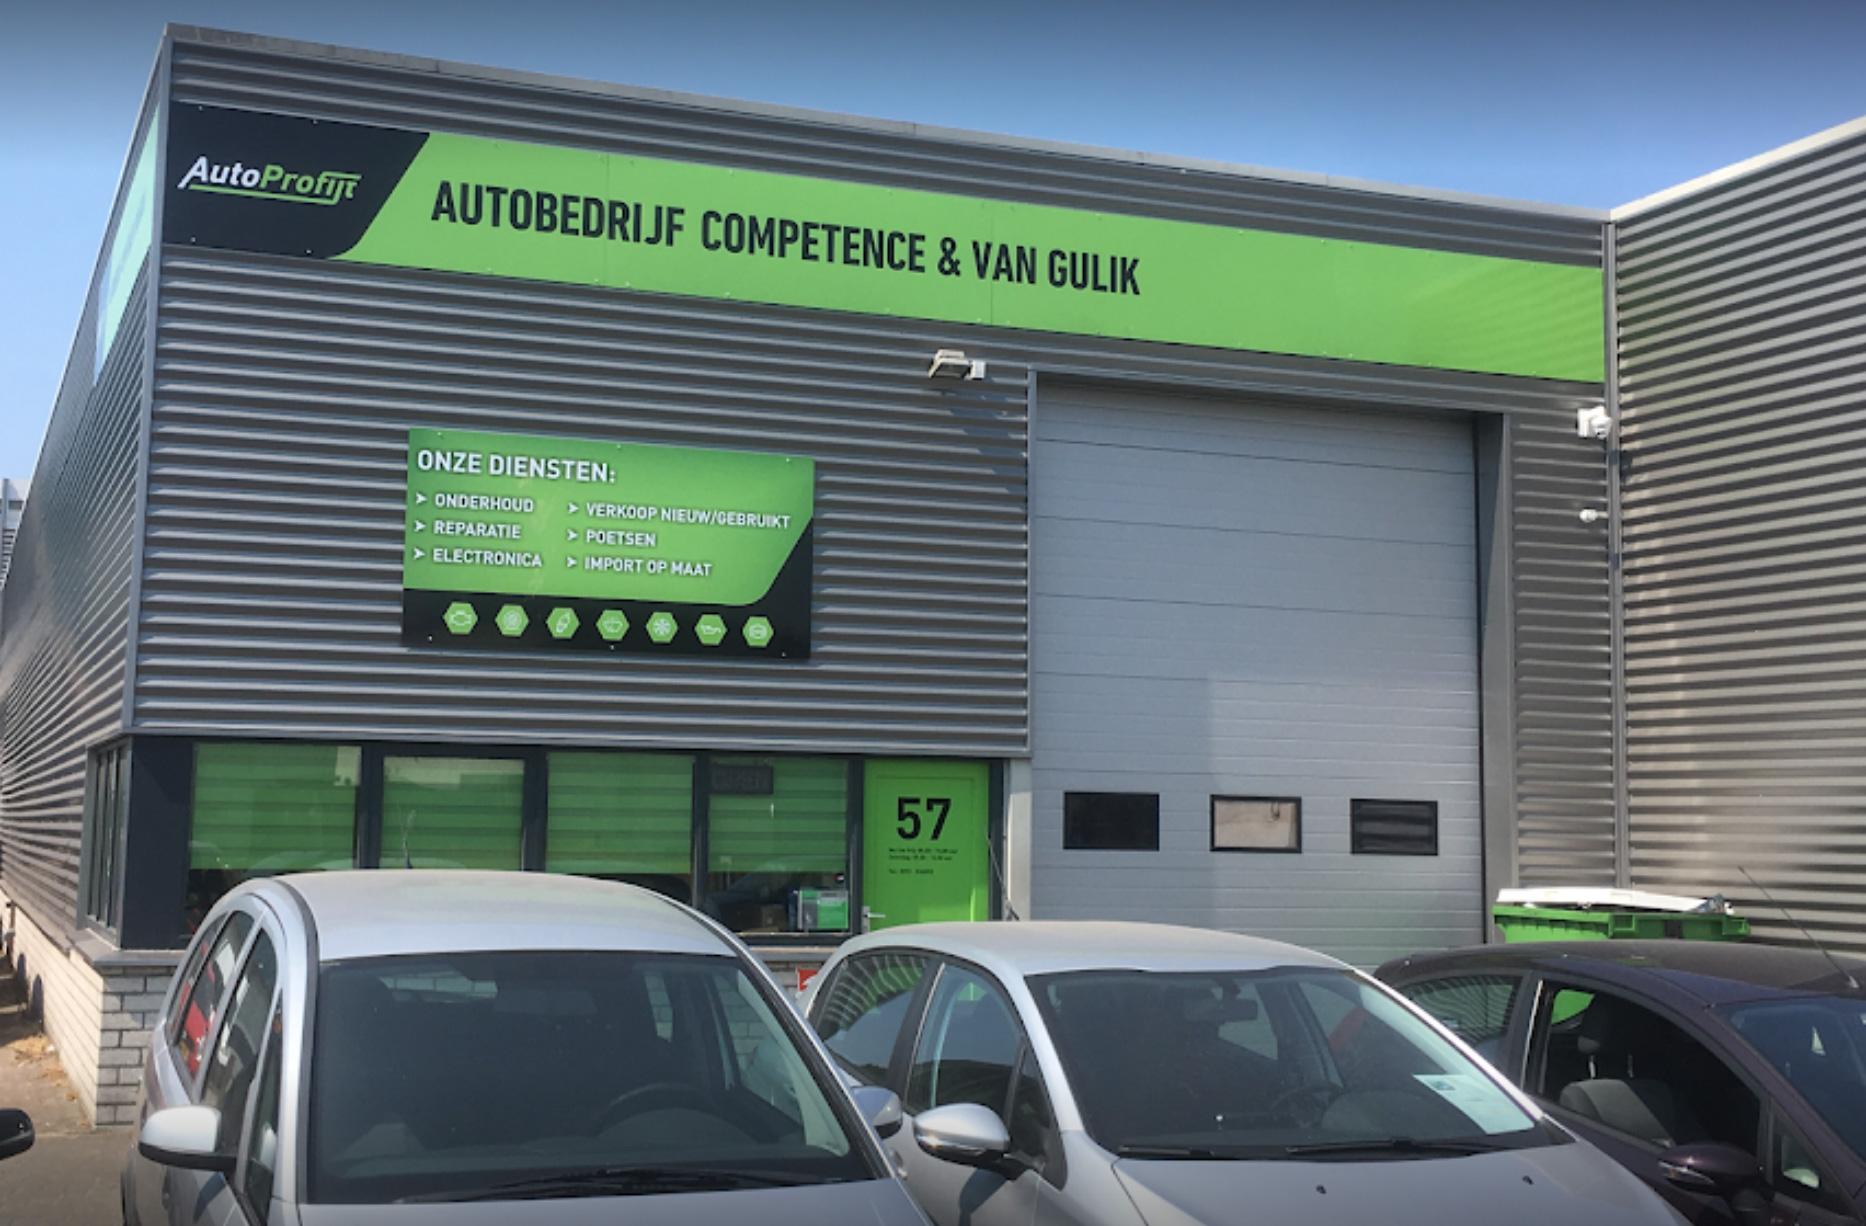 Autobedrijf Competence & van Gulik